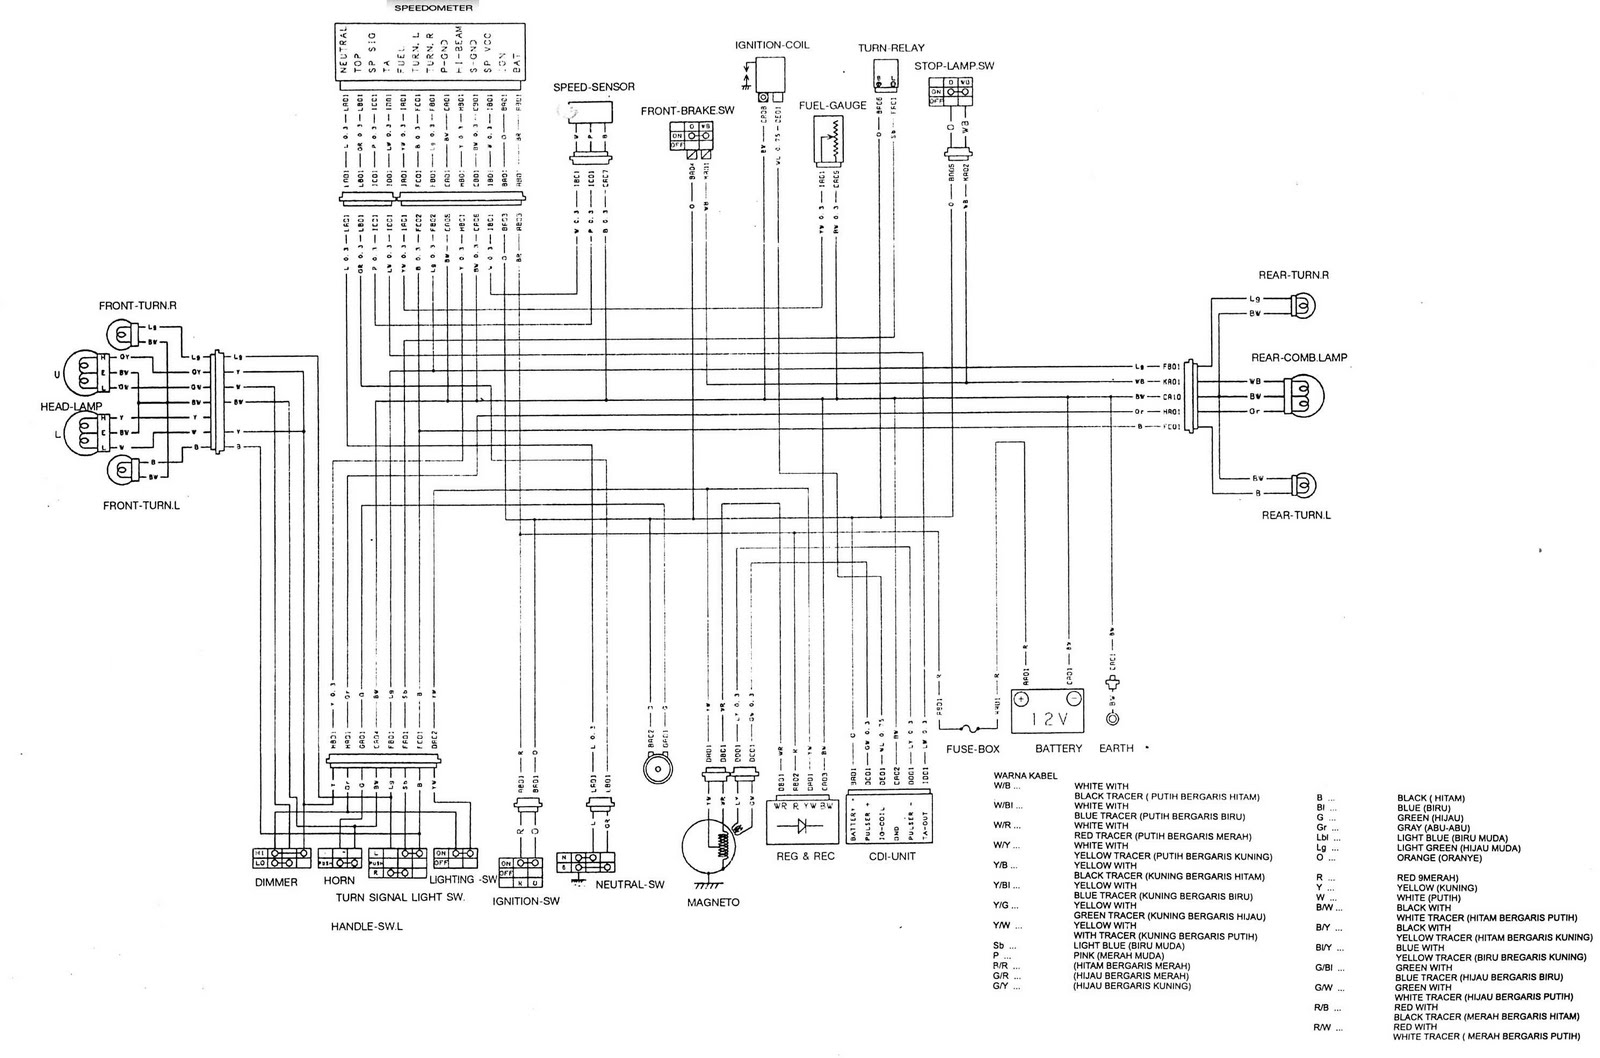 Blognya Iyuss: Diagram Kelistrikan Satria FU